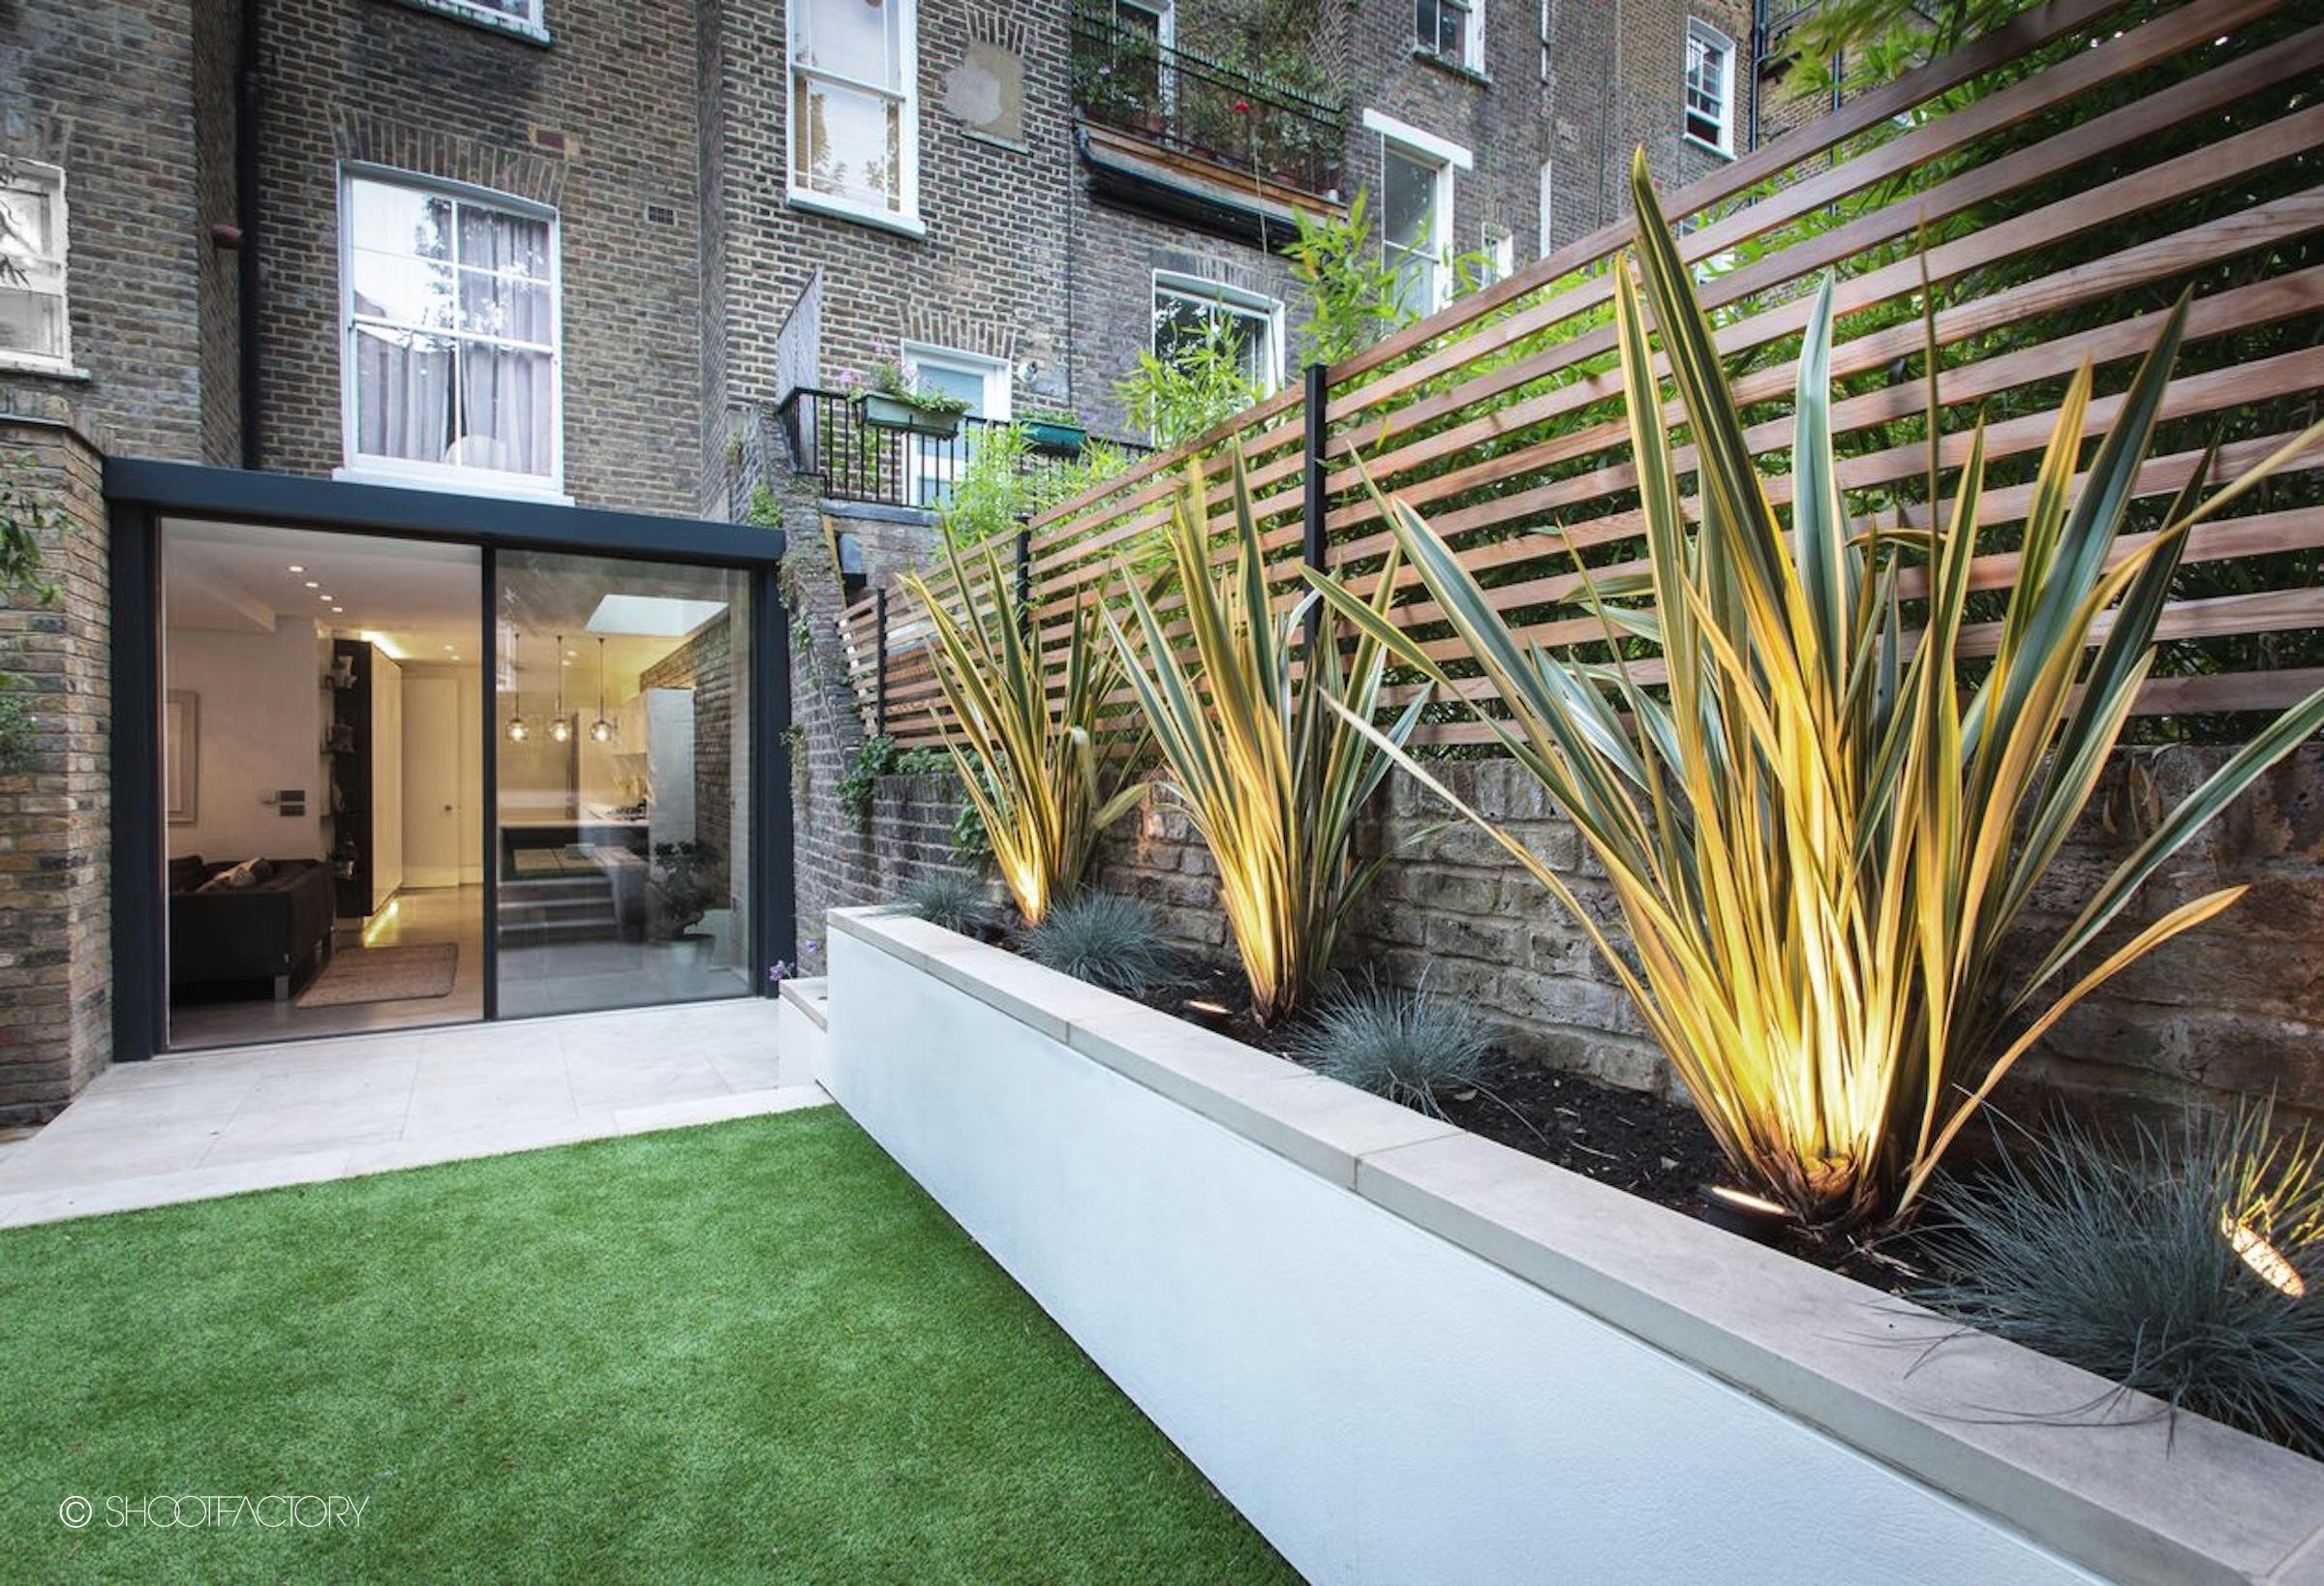 Photo of Leamington Road Villas by Studio 1 Architects